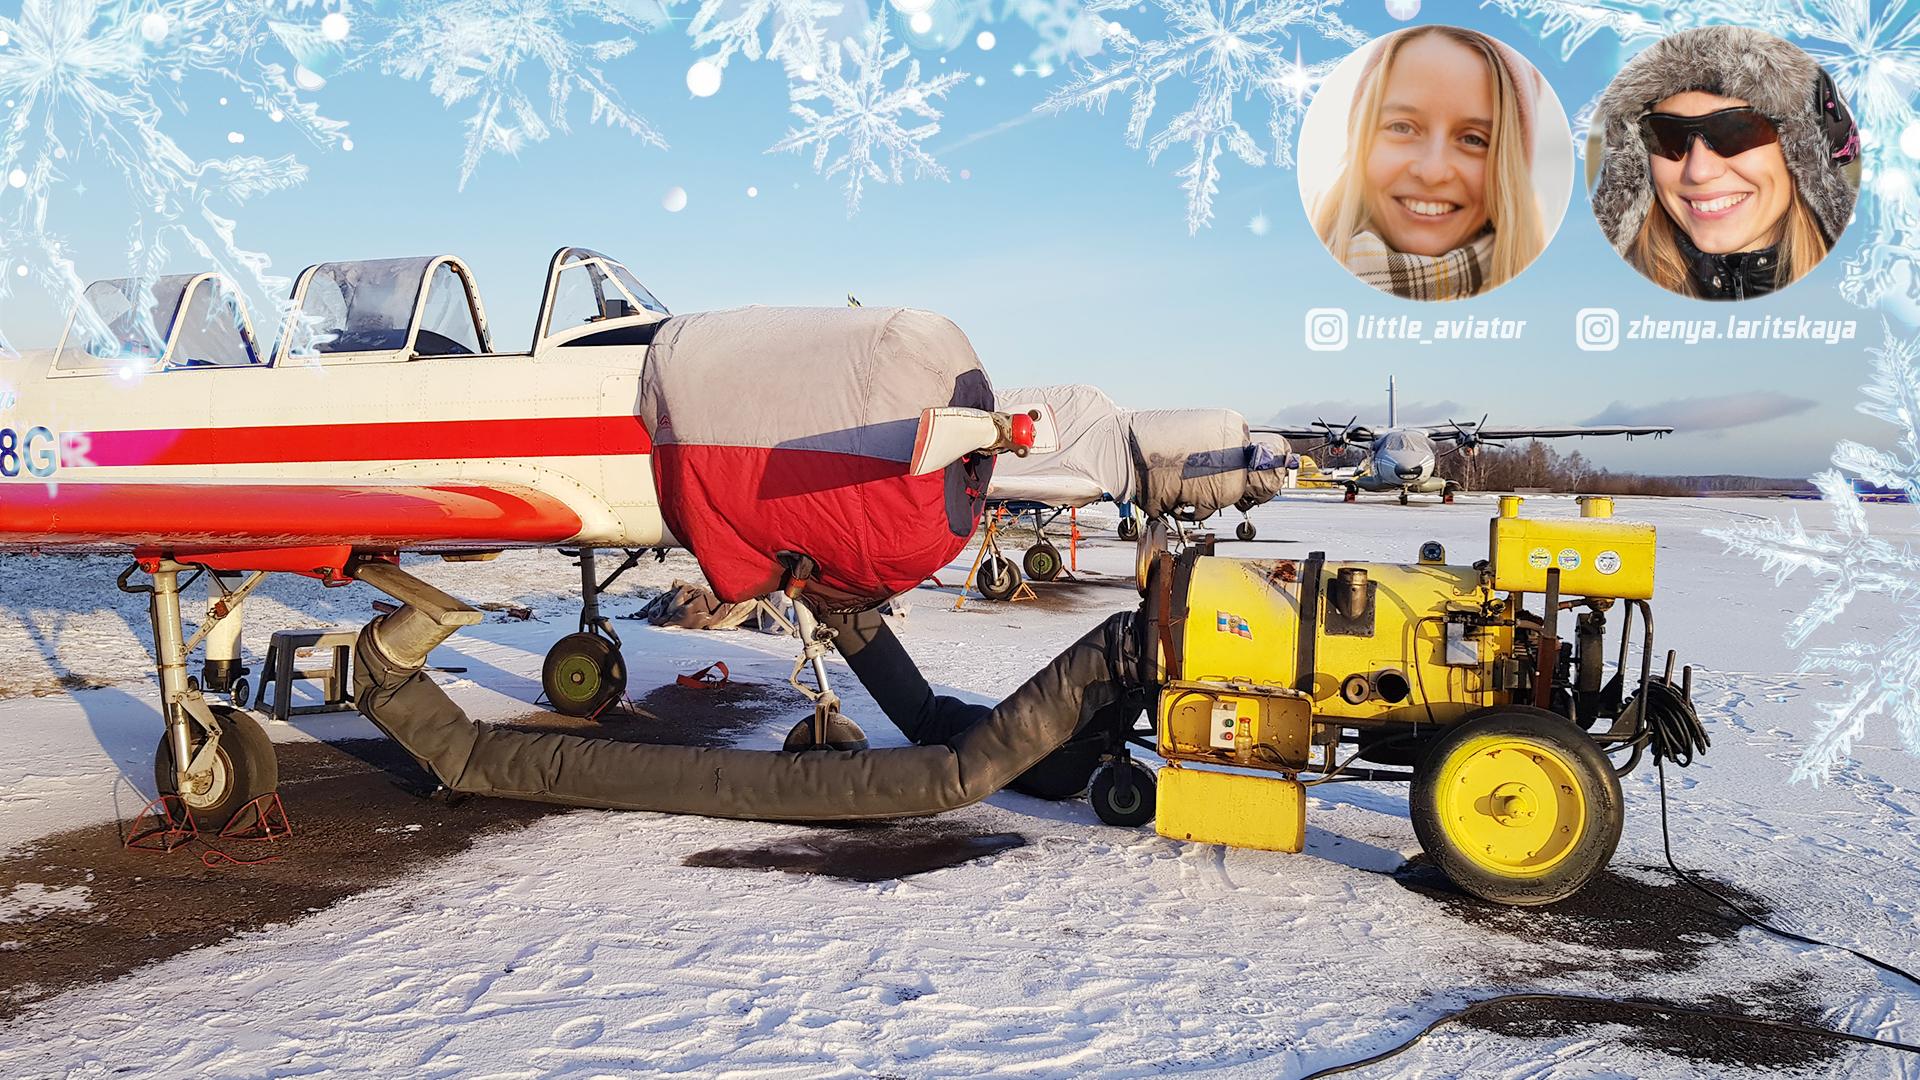 Flying in the winter time - Особенности зимних полётов